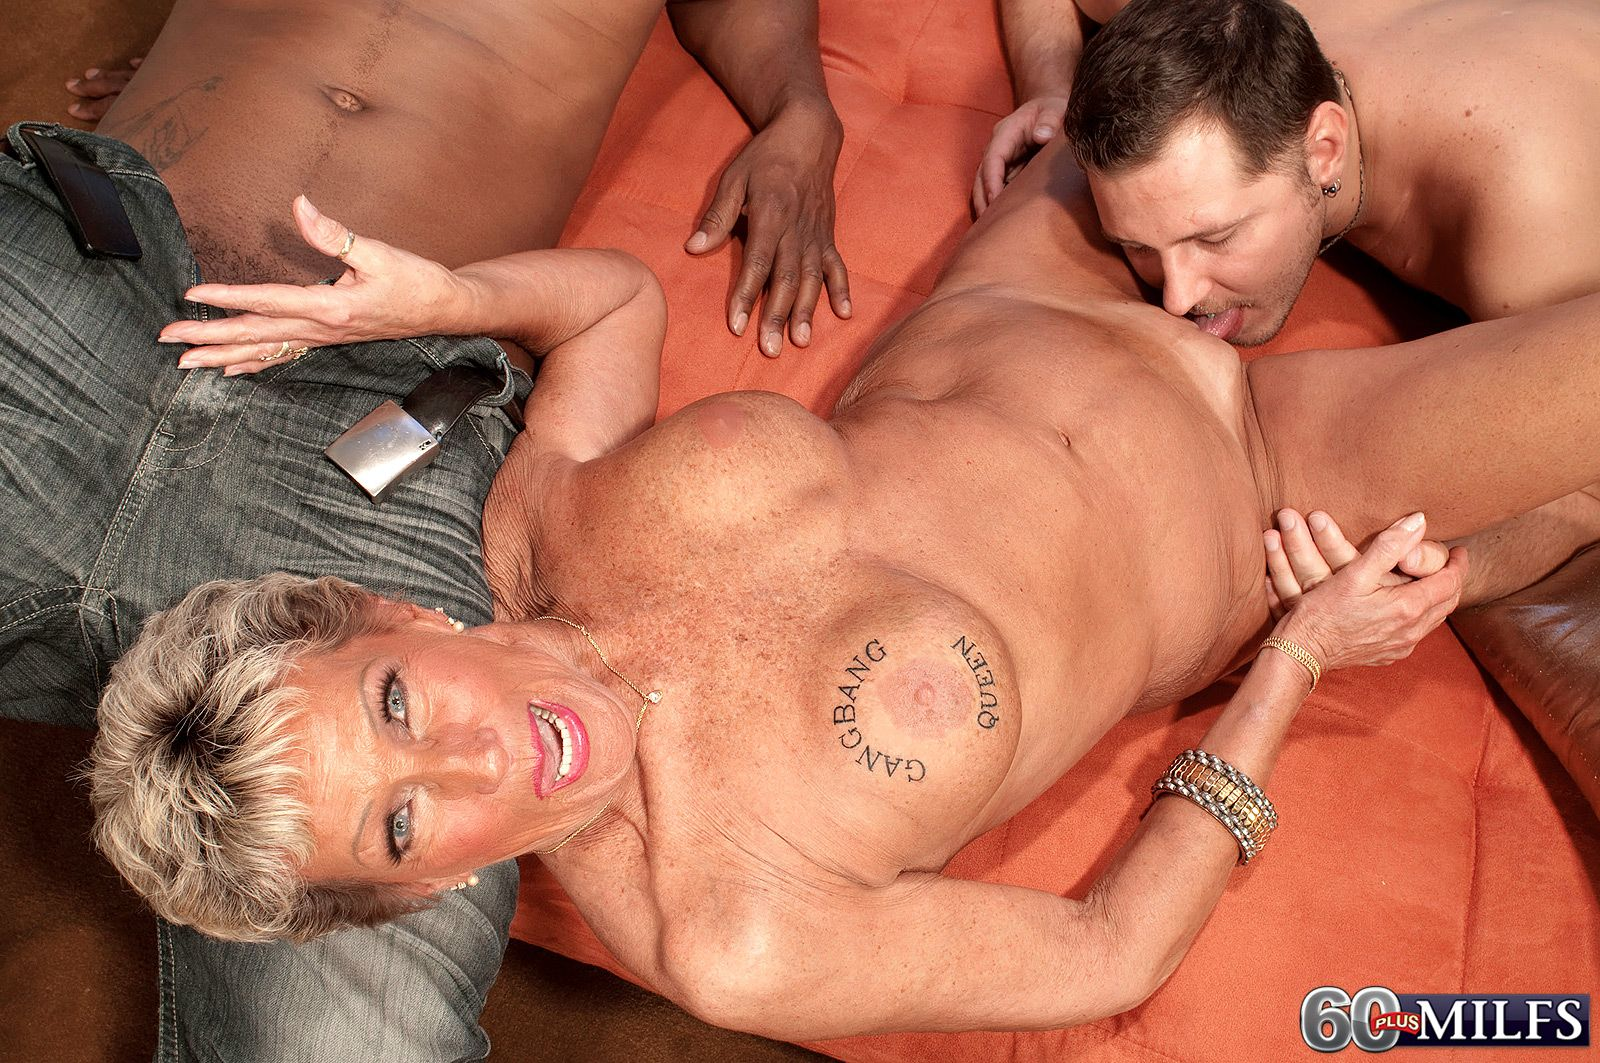 70 plus MILF Sandra Ann taking white and black cock in MMF threesome